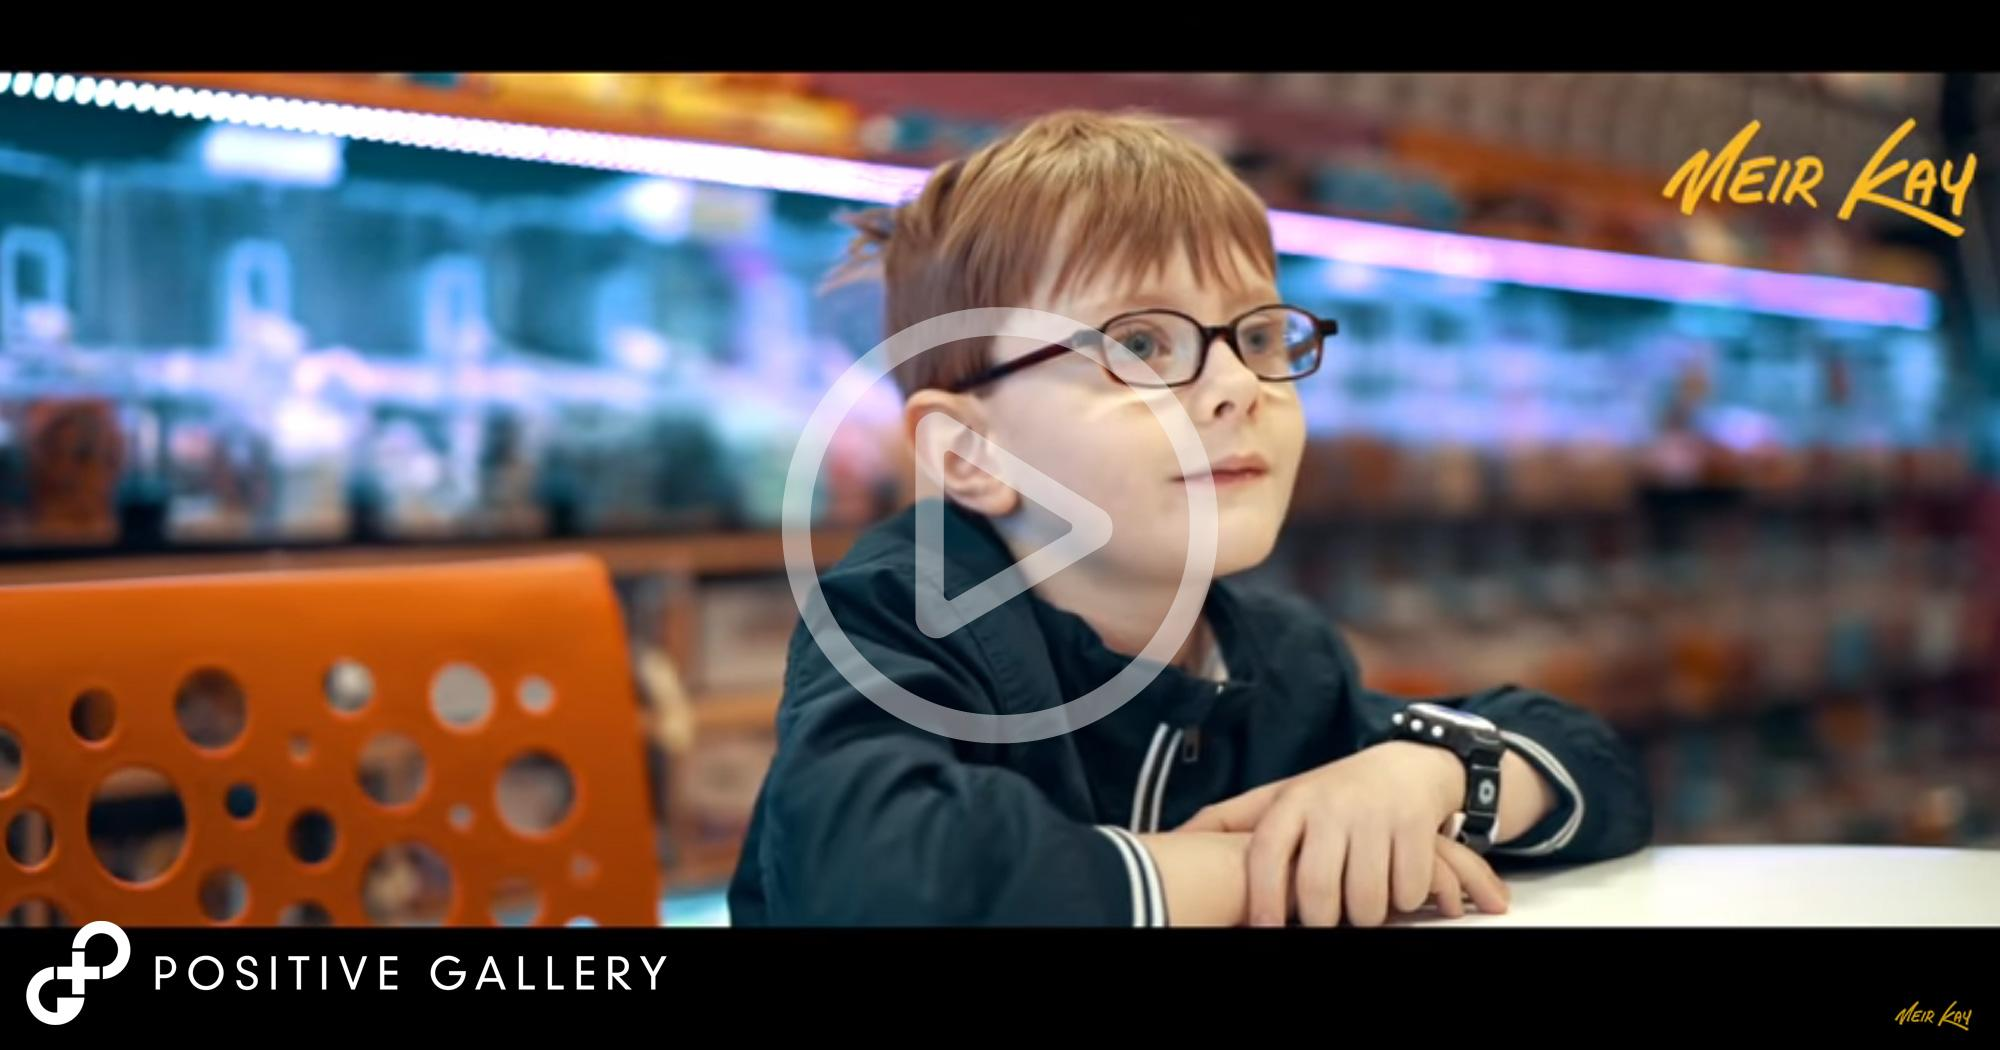 A Boy Teaches an Adult About Generosity